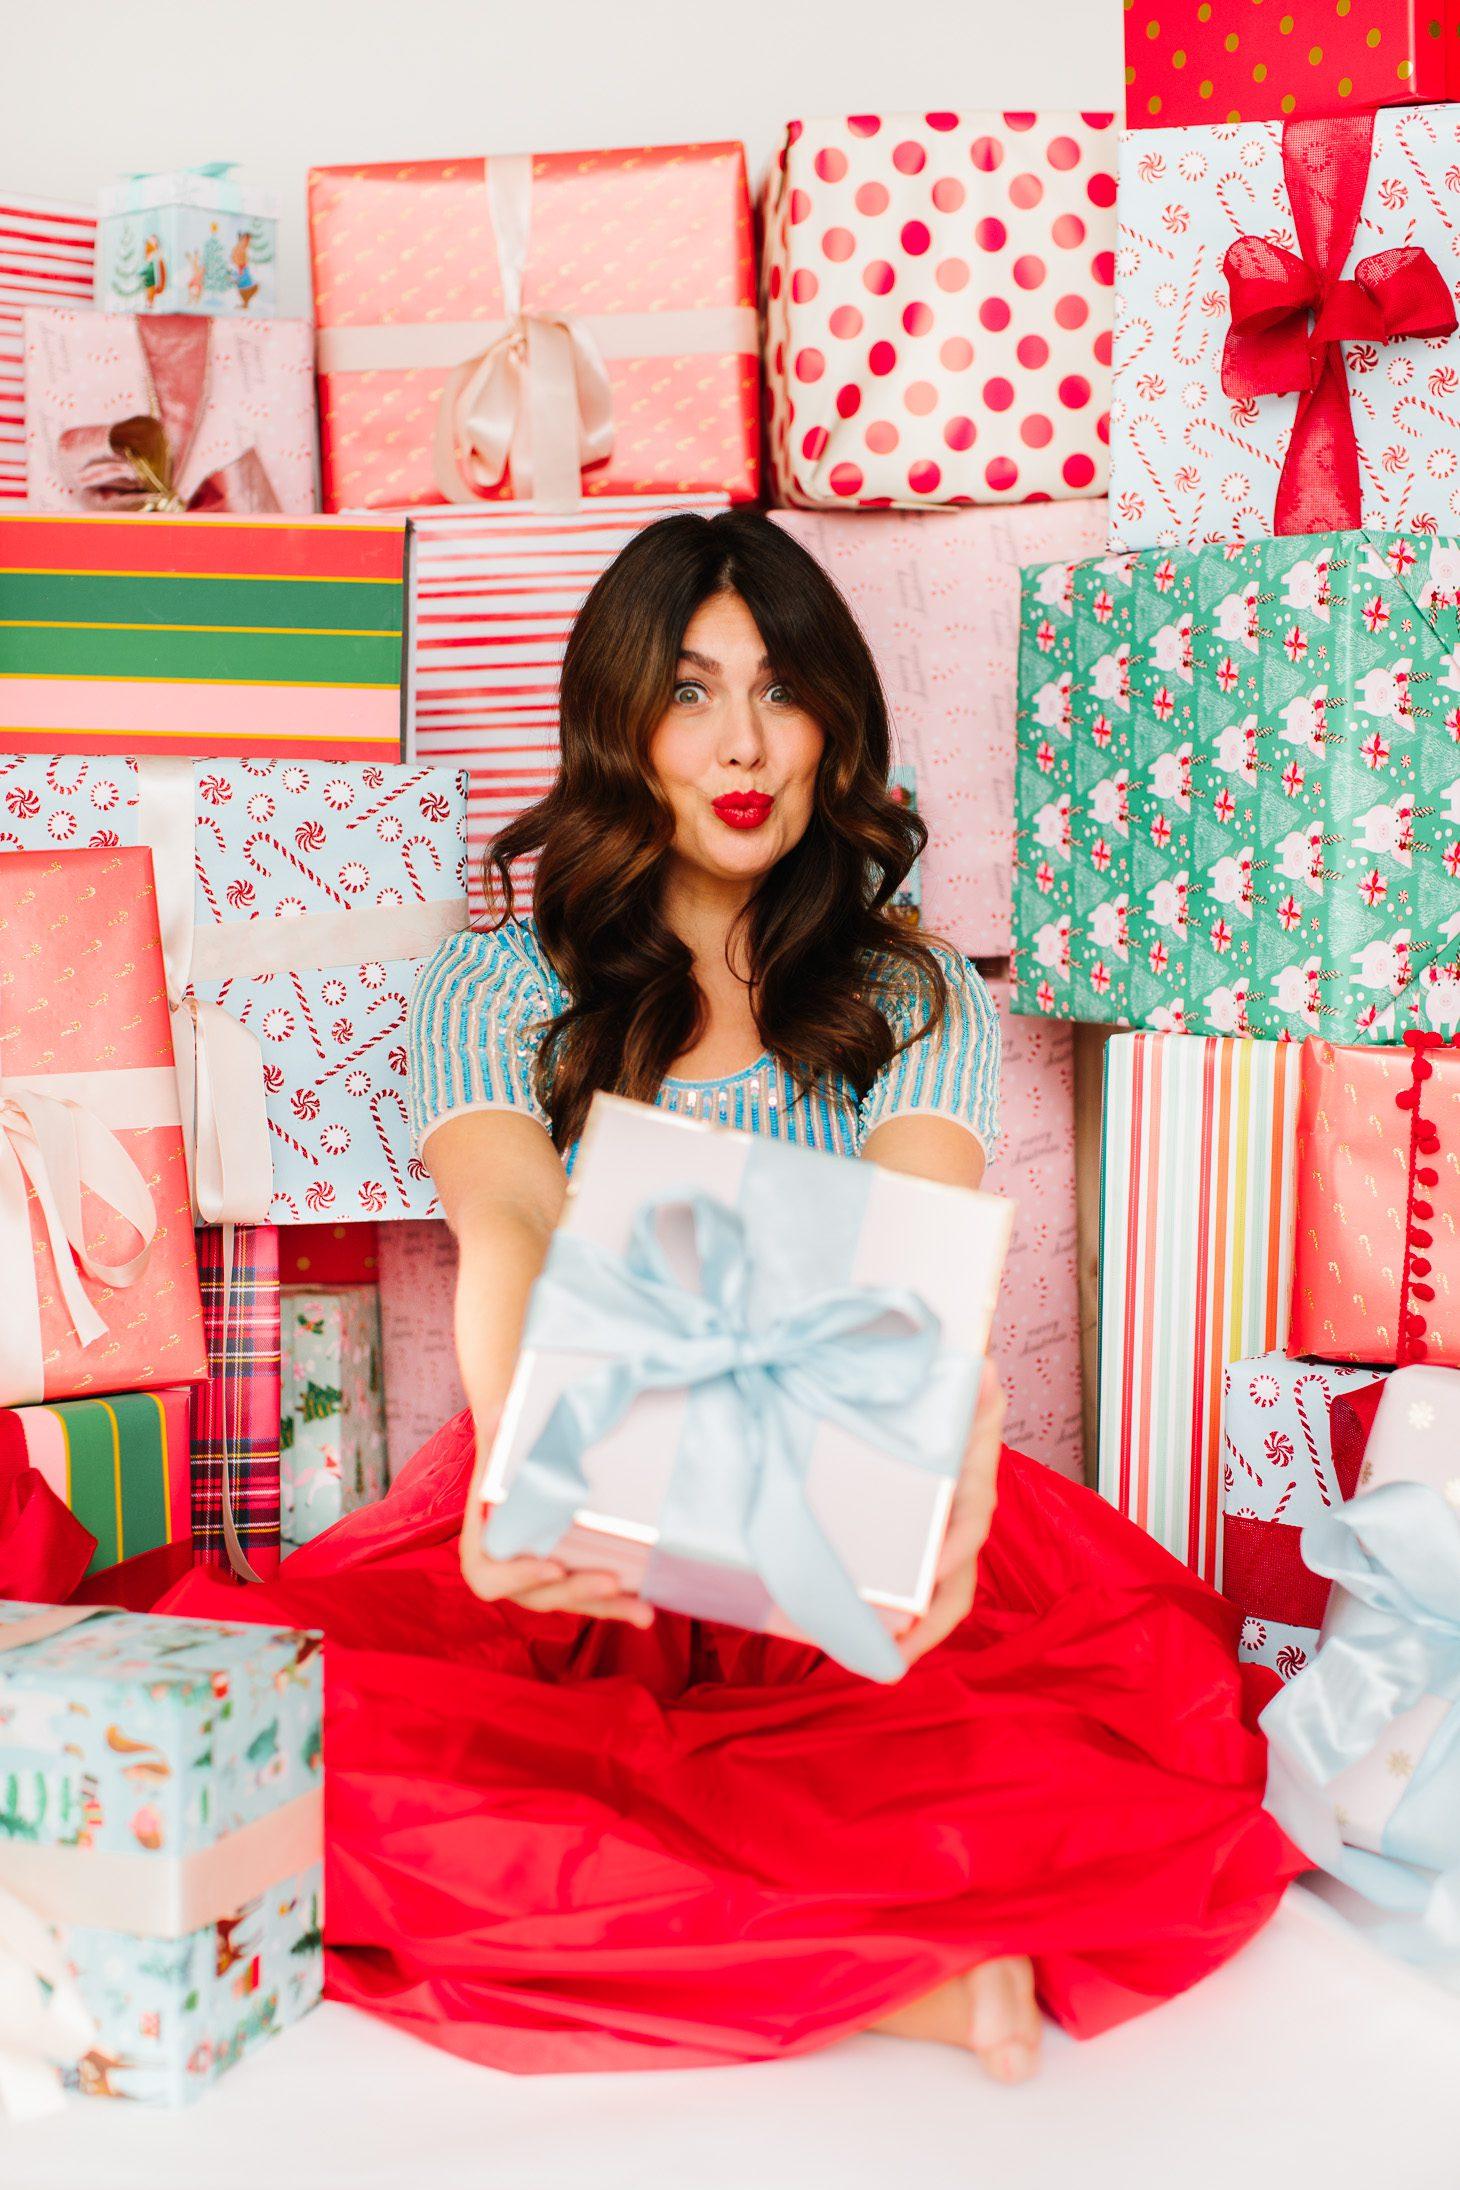 Jillian Harris 12 Days of Christmas Giveaways